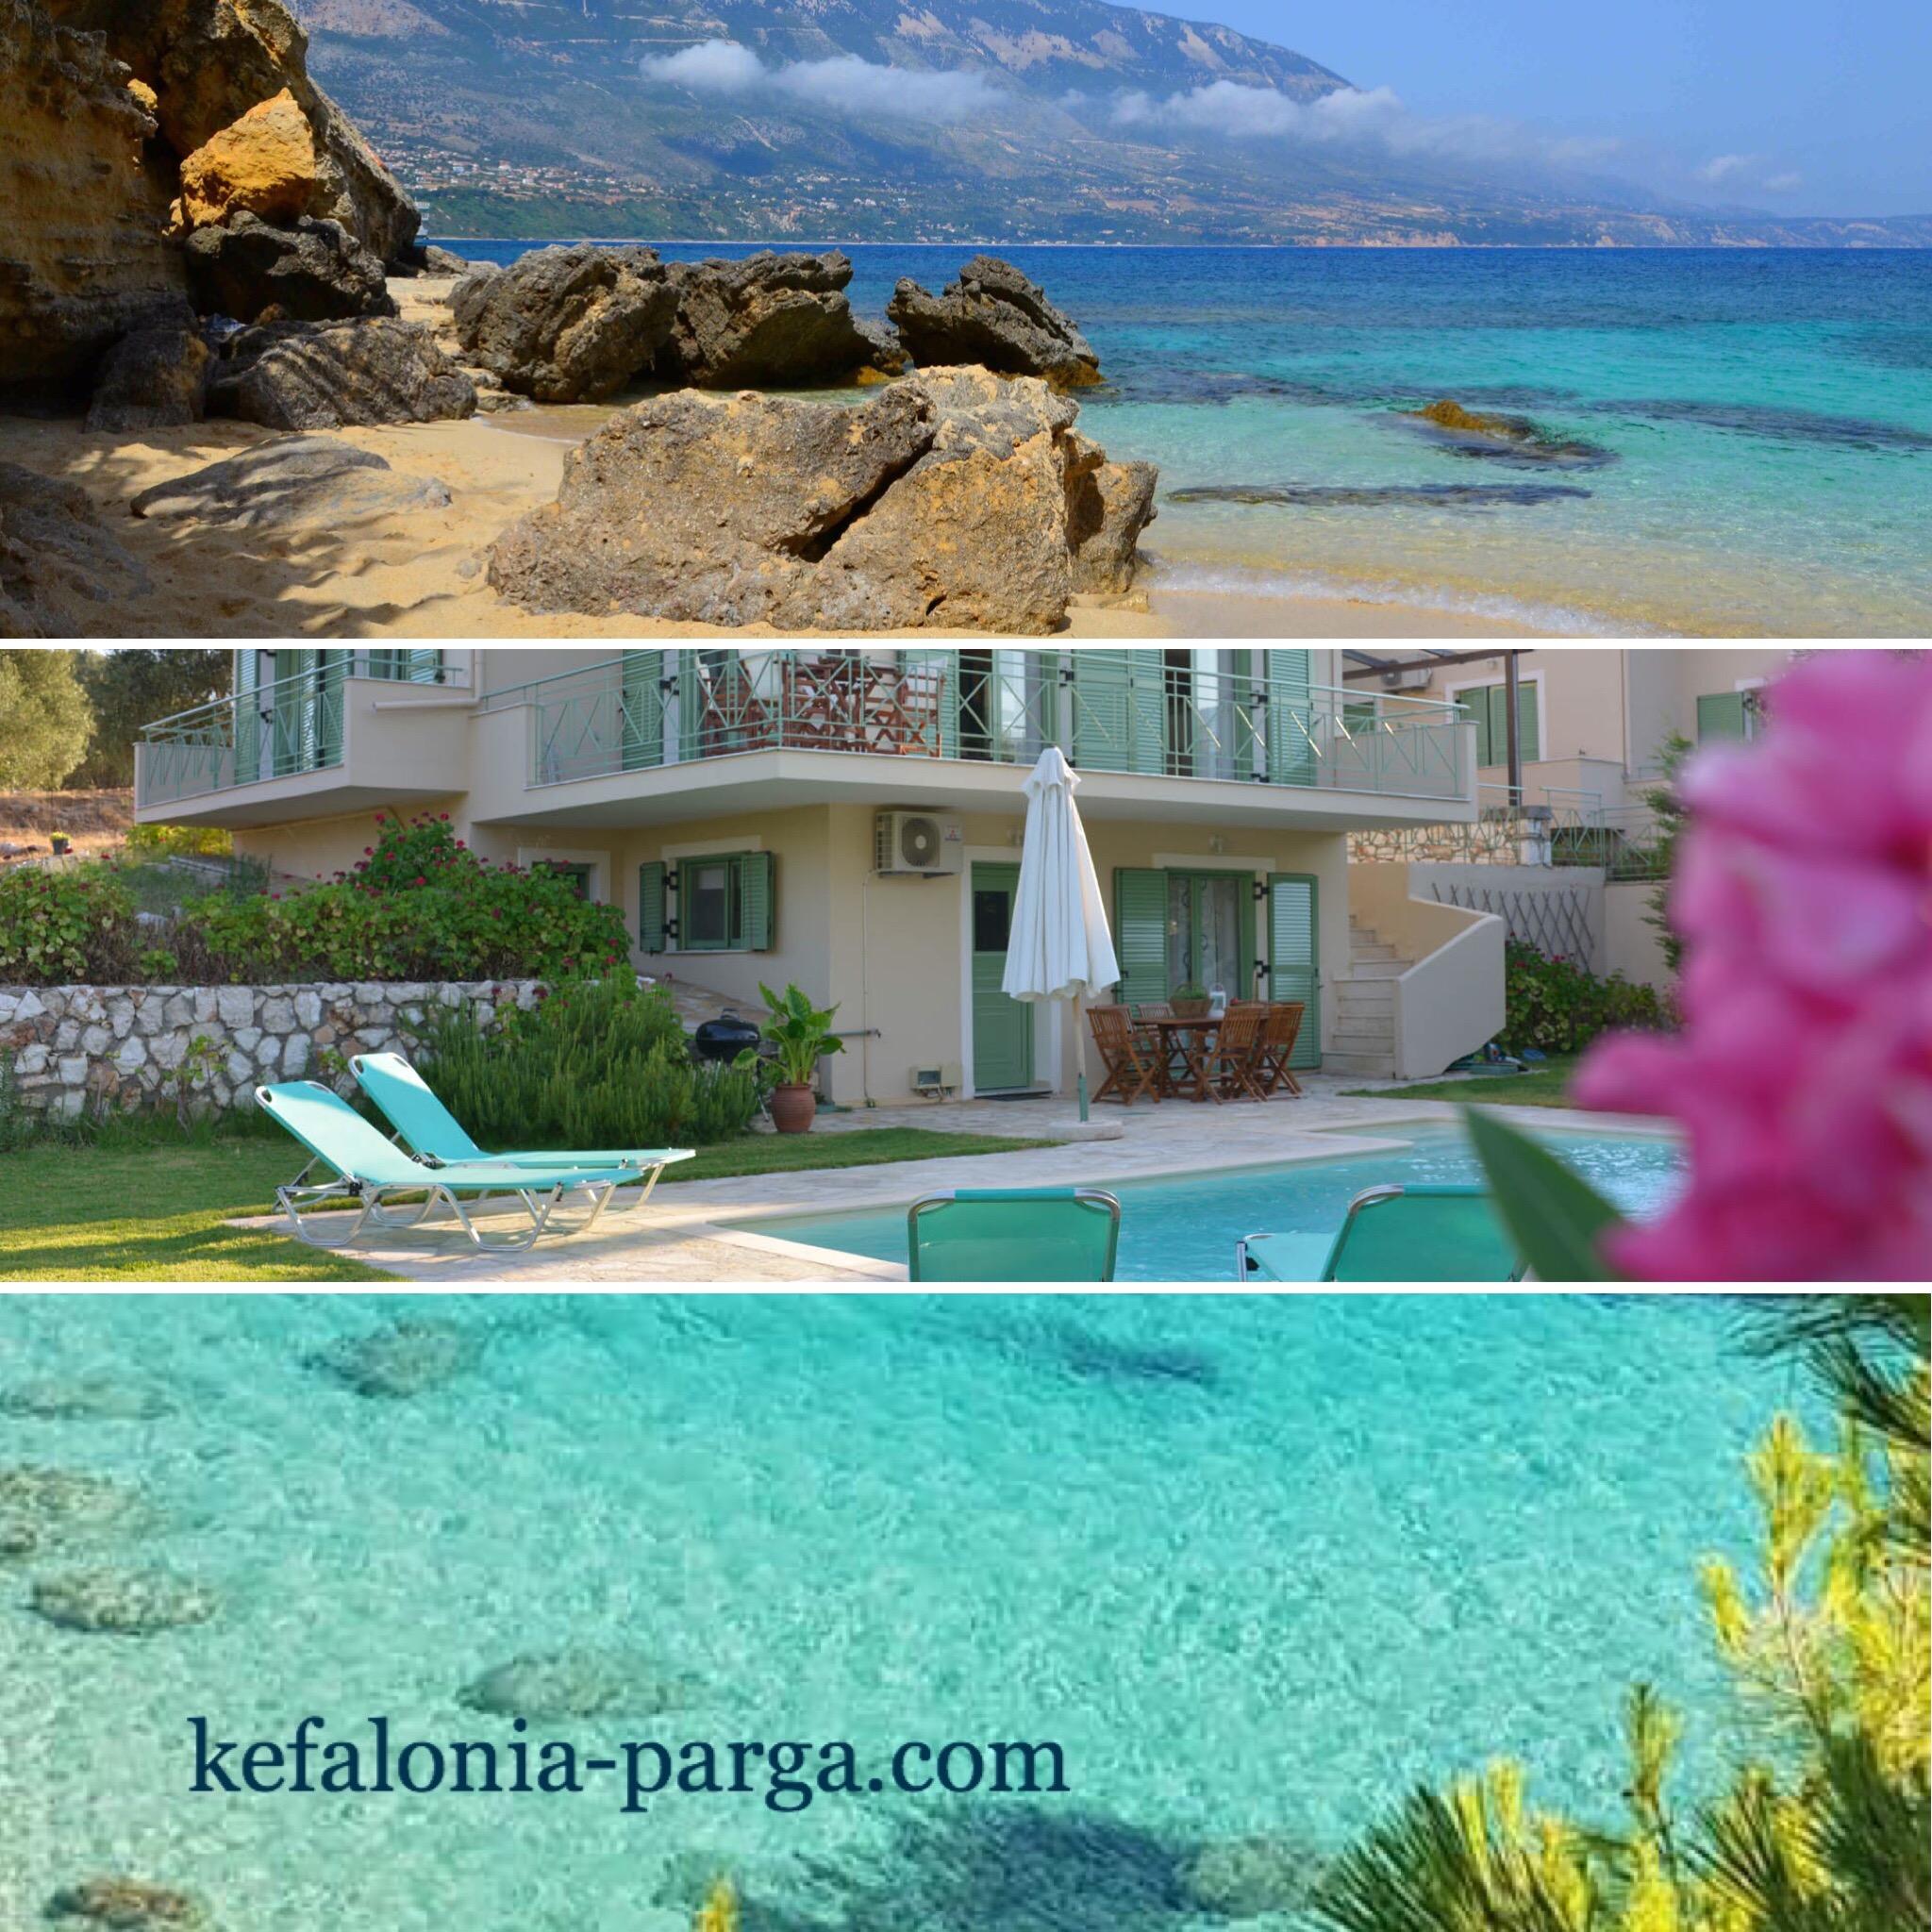 Kefalonia villas with pool: amazing 3 bedroom villa near picturesque Agios Thomas beach